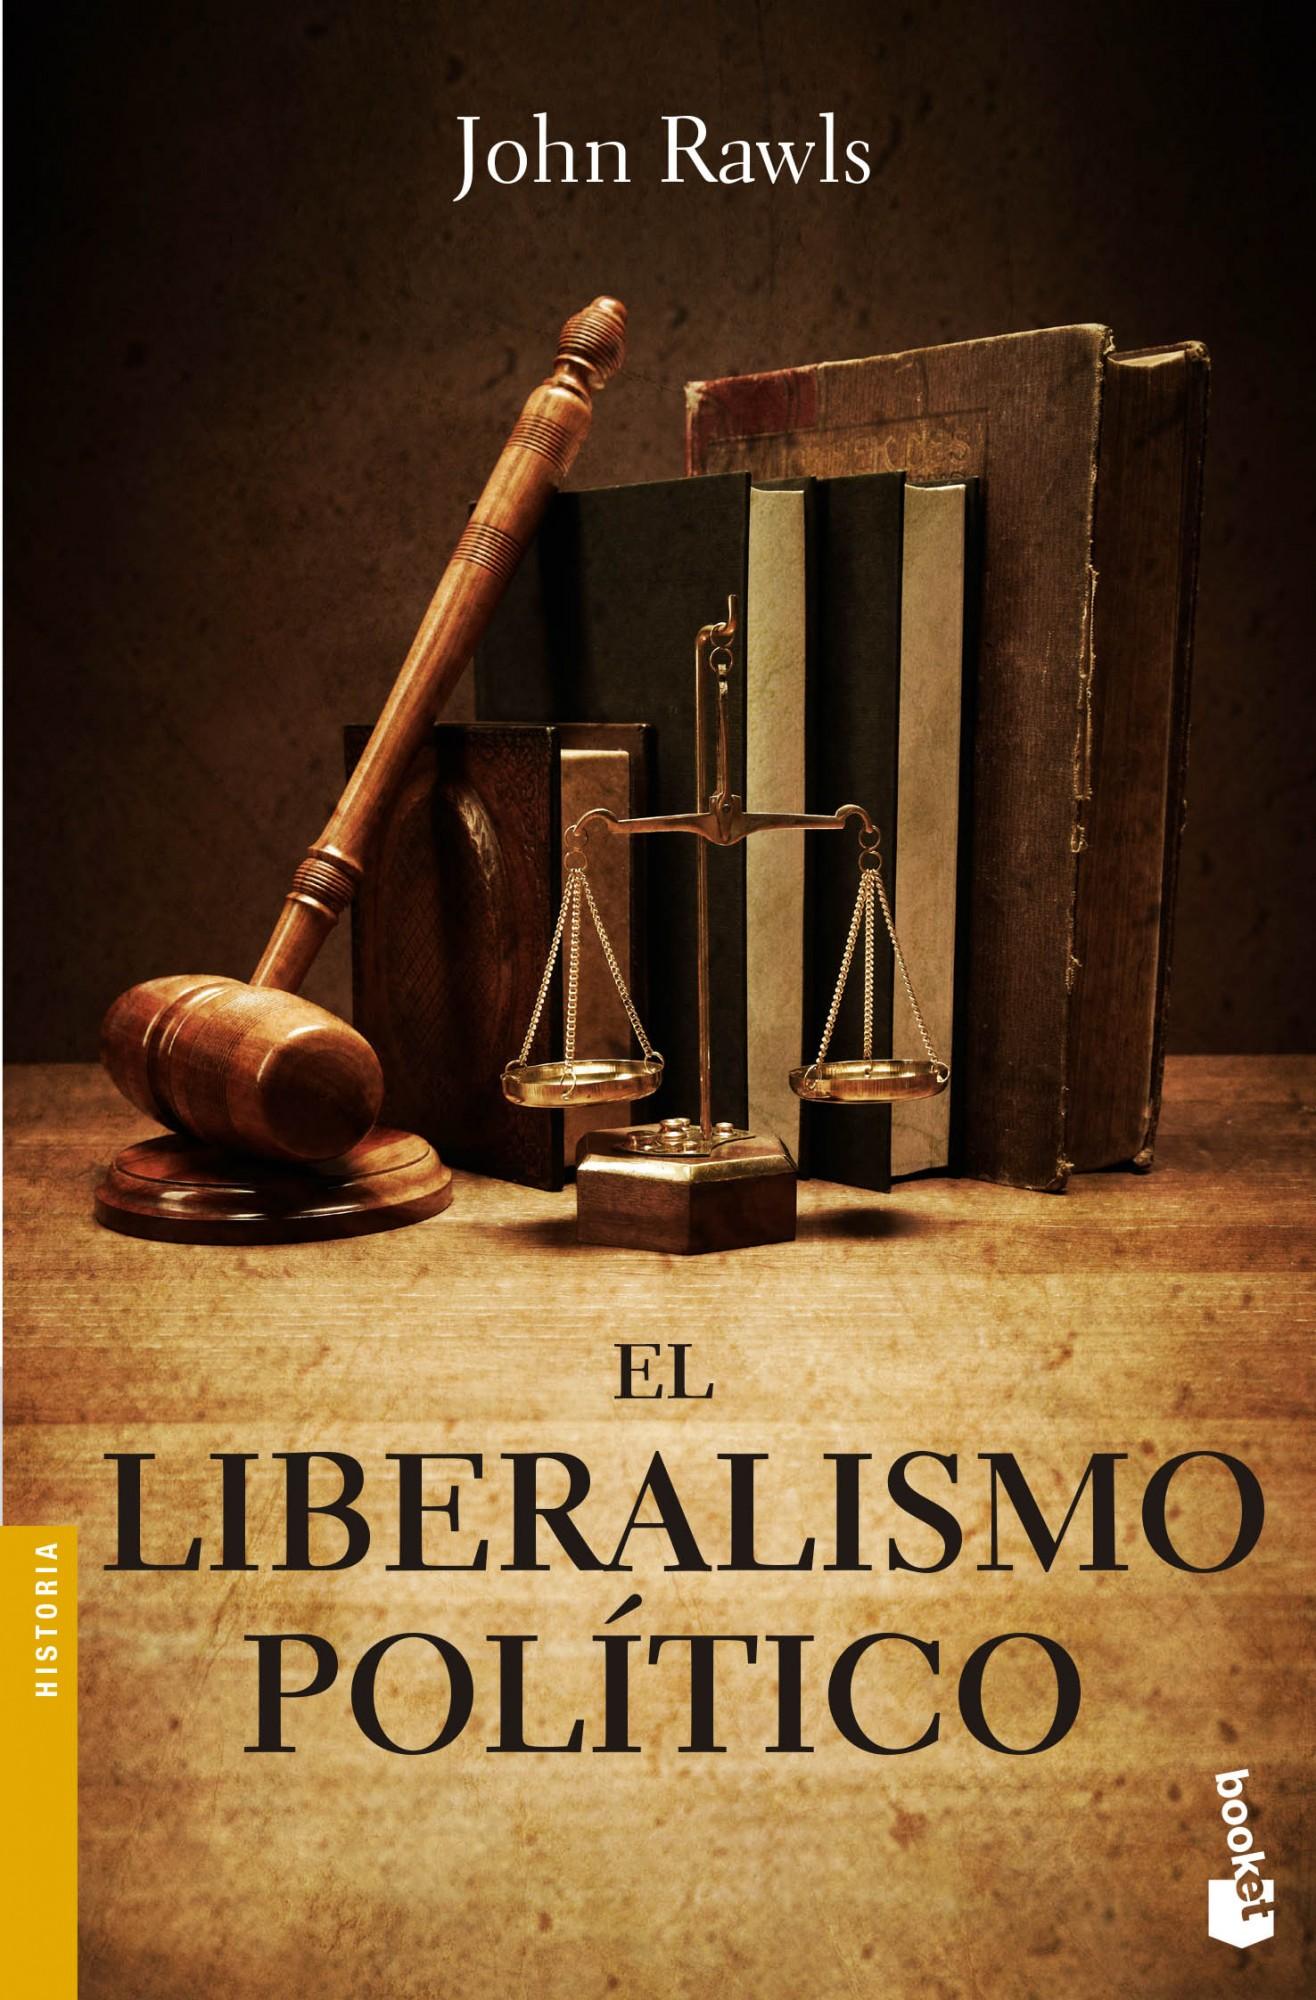 Liberalismo Politico de John Rawls